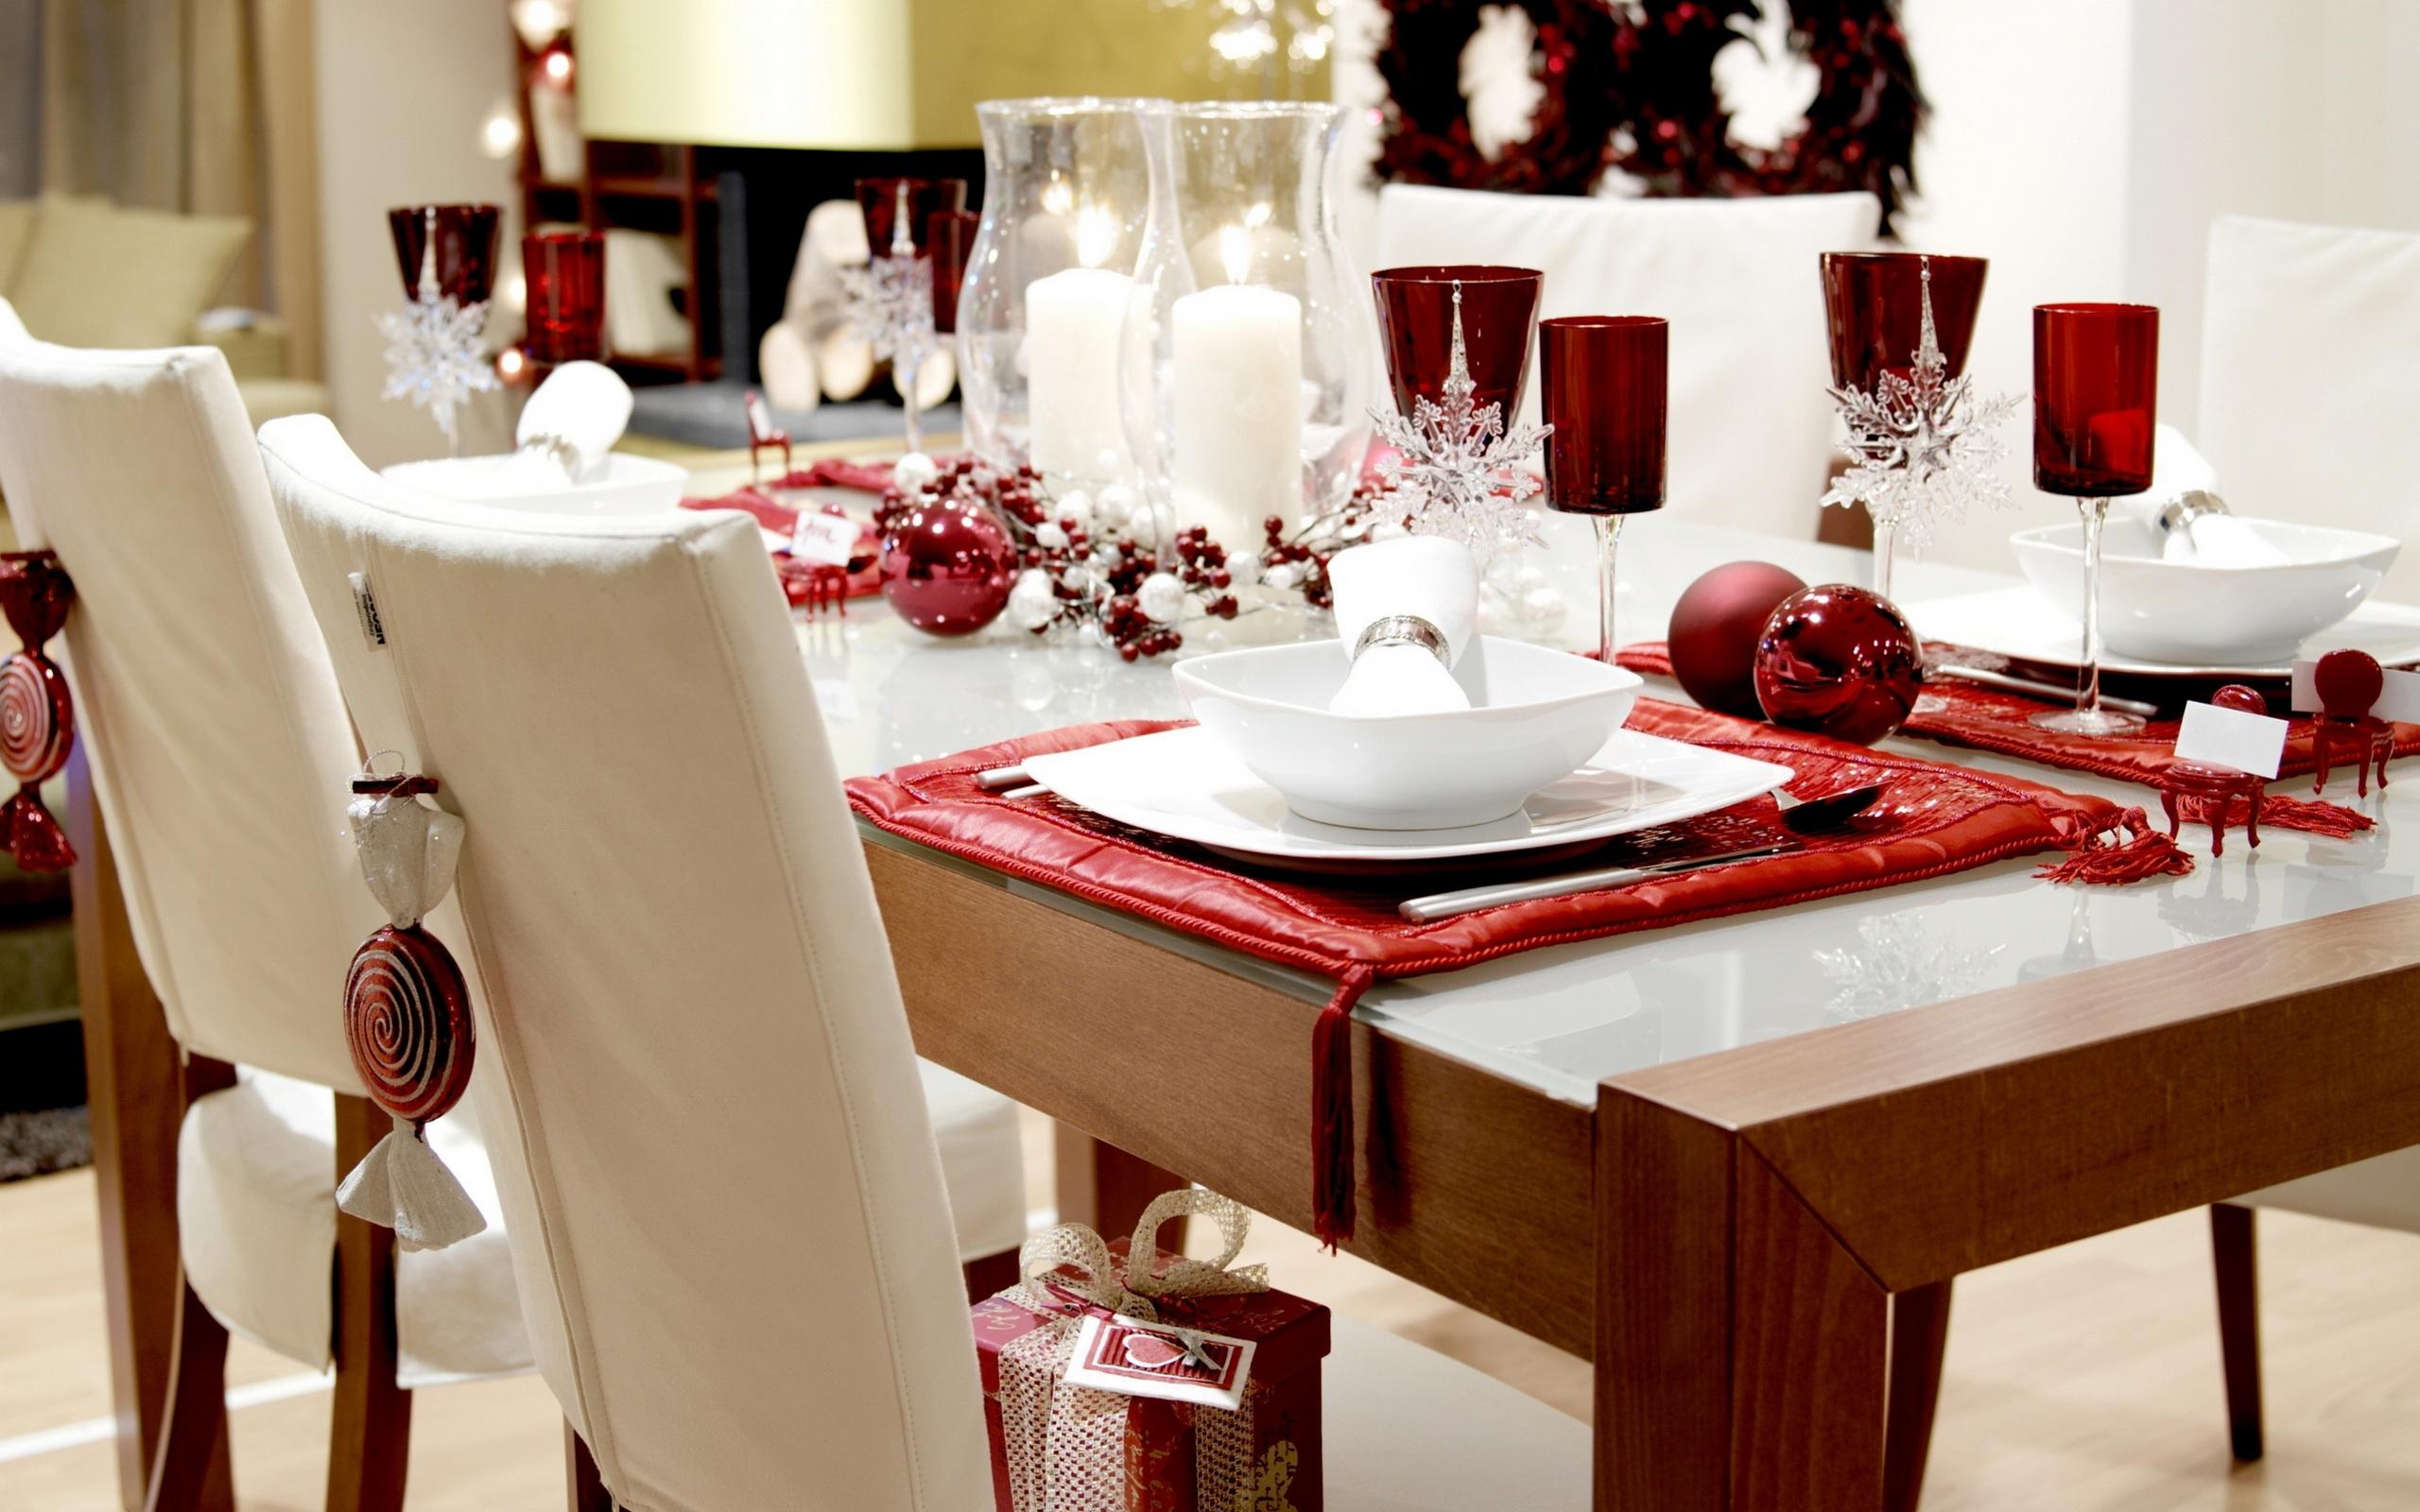 Holiday table wallpapers and images wallpapers pictures - Como decorar una mesa de comedor ...